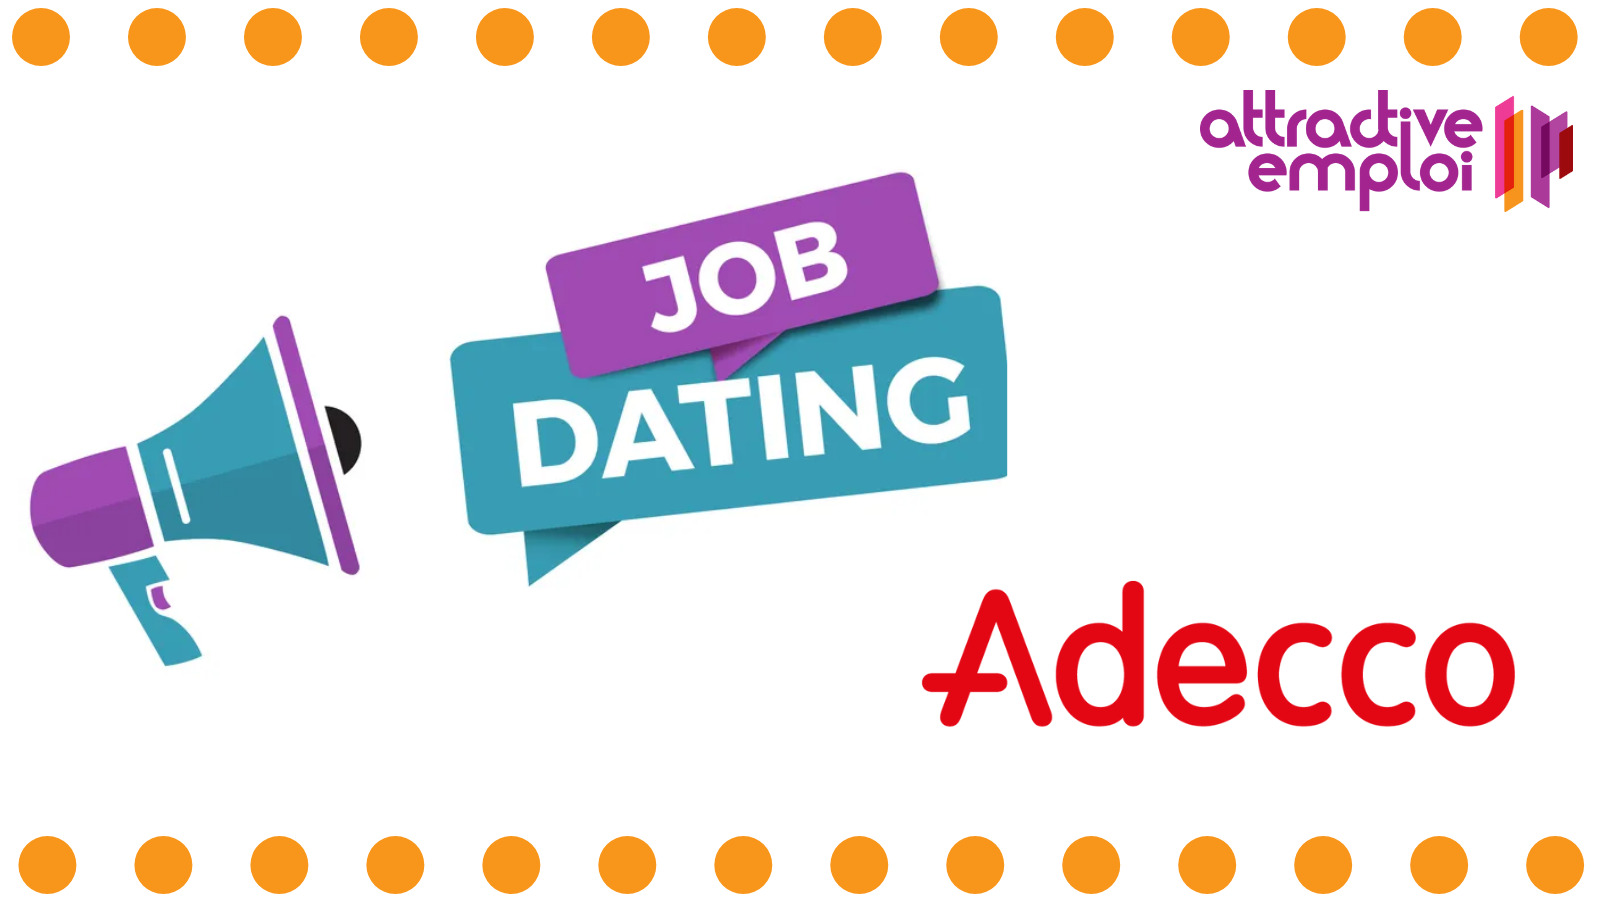 Job dating Adecco